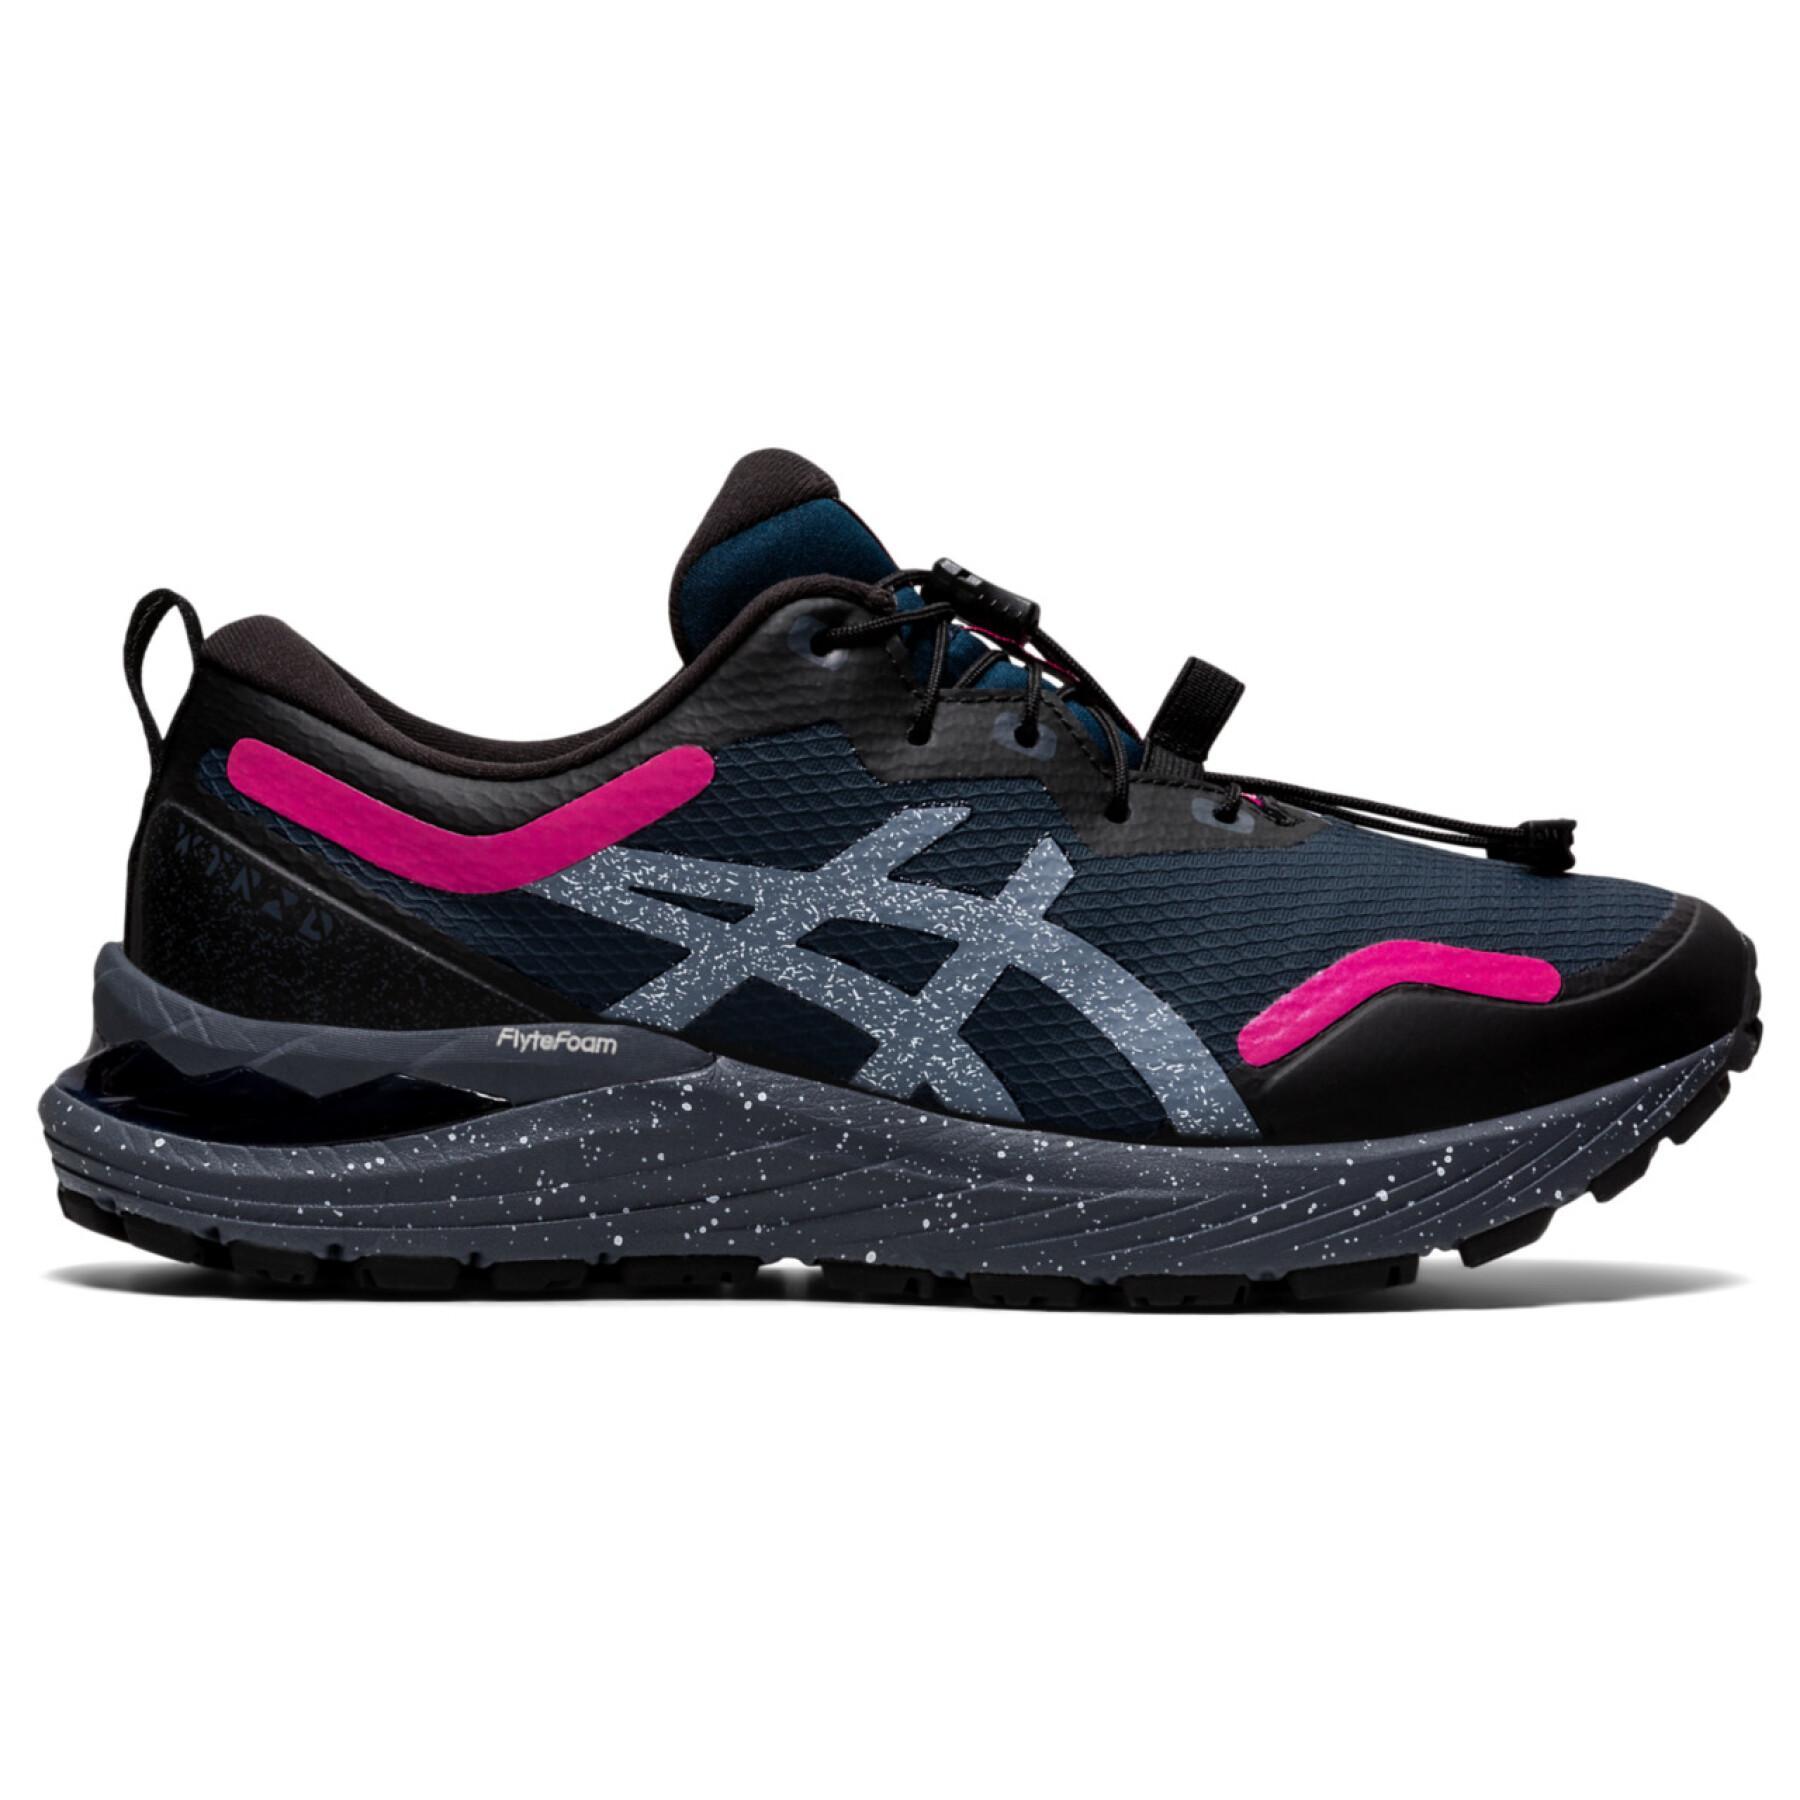 Asics Gel-Cumulus 23 Awl Women's Shoes